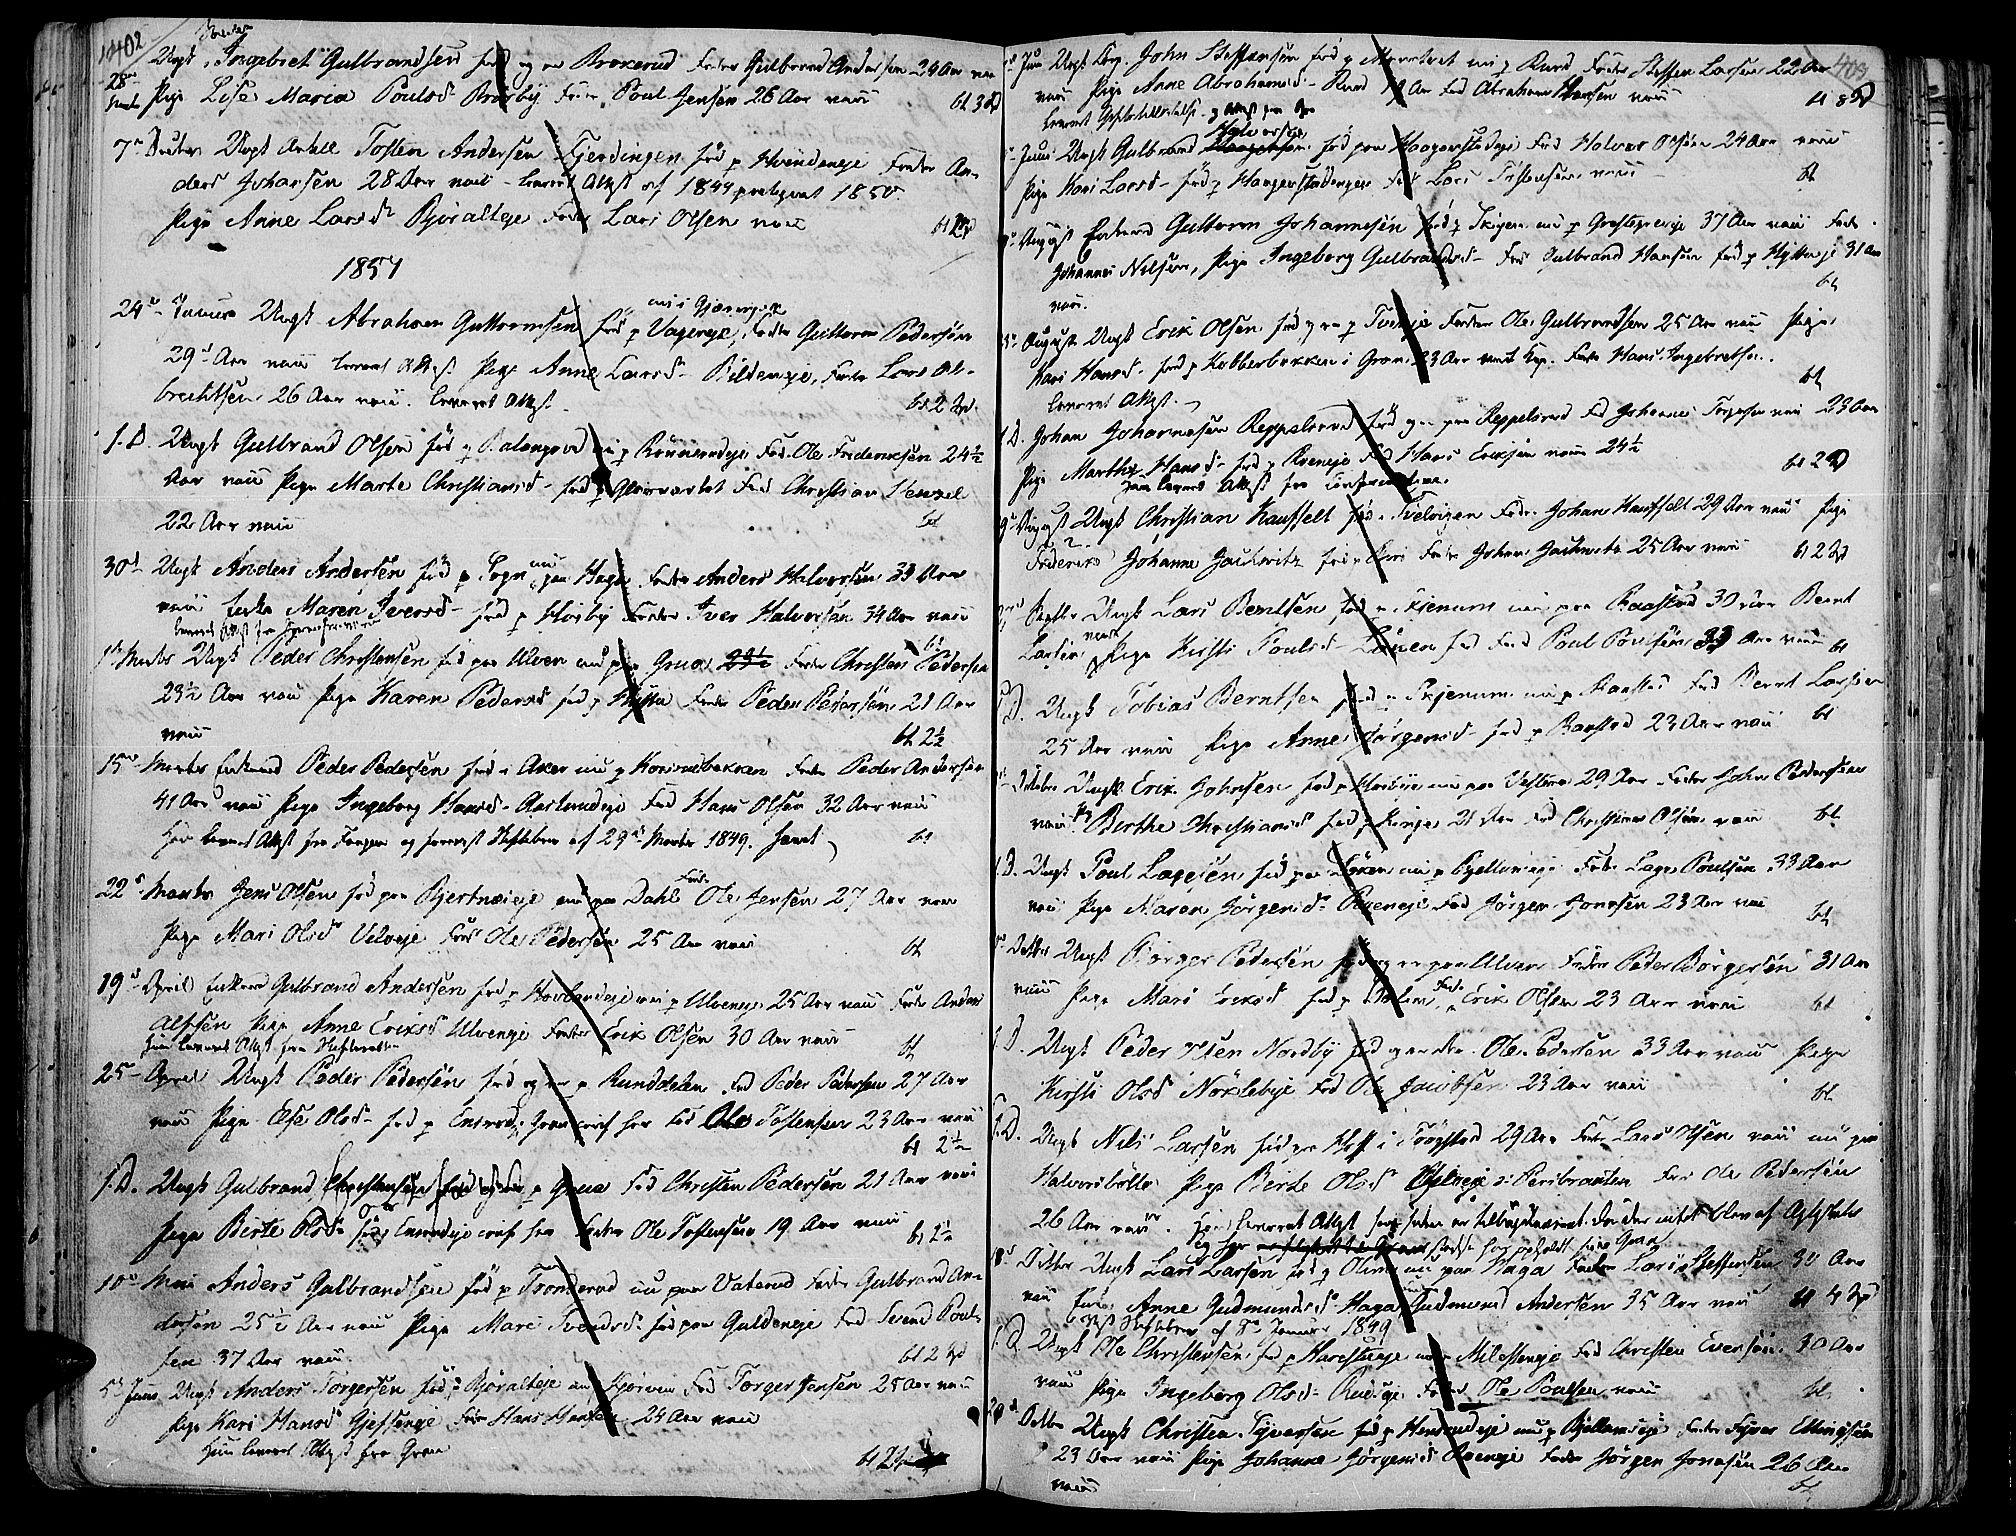 SAH, Jevnaker prestekontor, Ministerialbok nr. 4, 1800-1861, s. 402-403